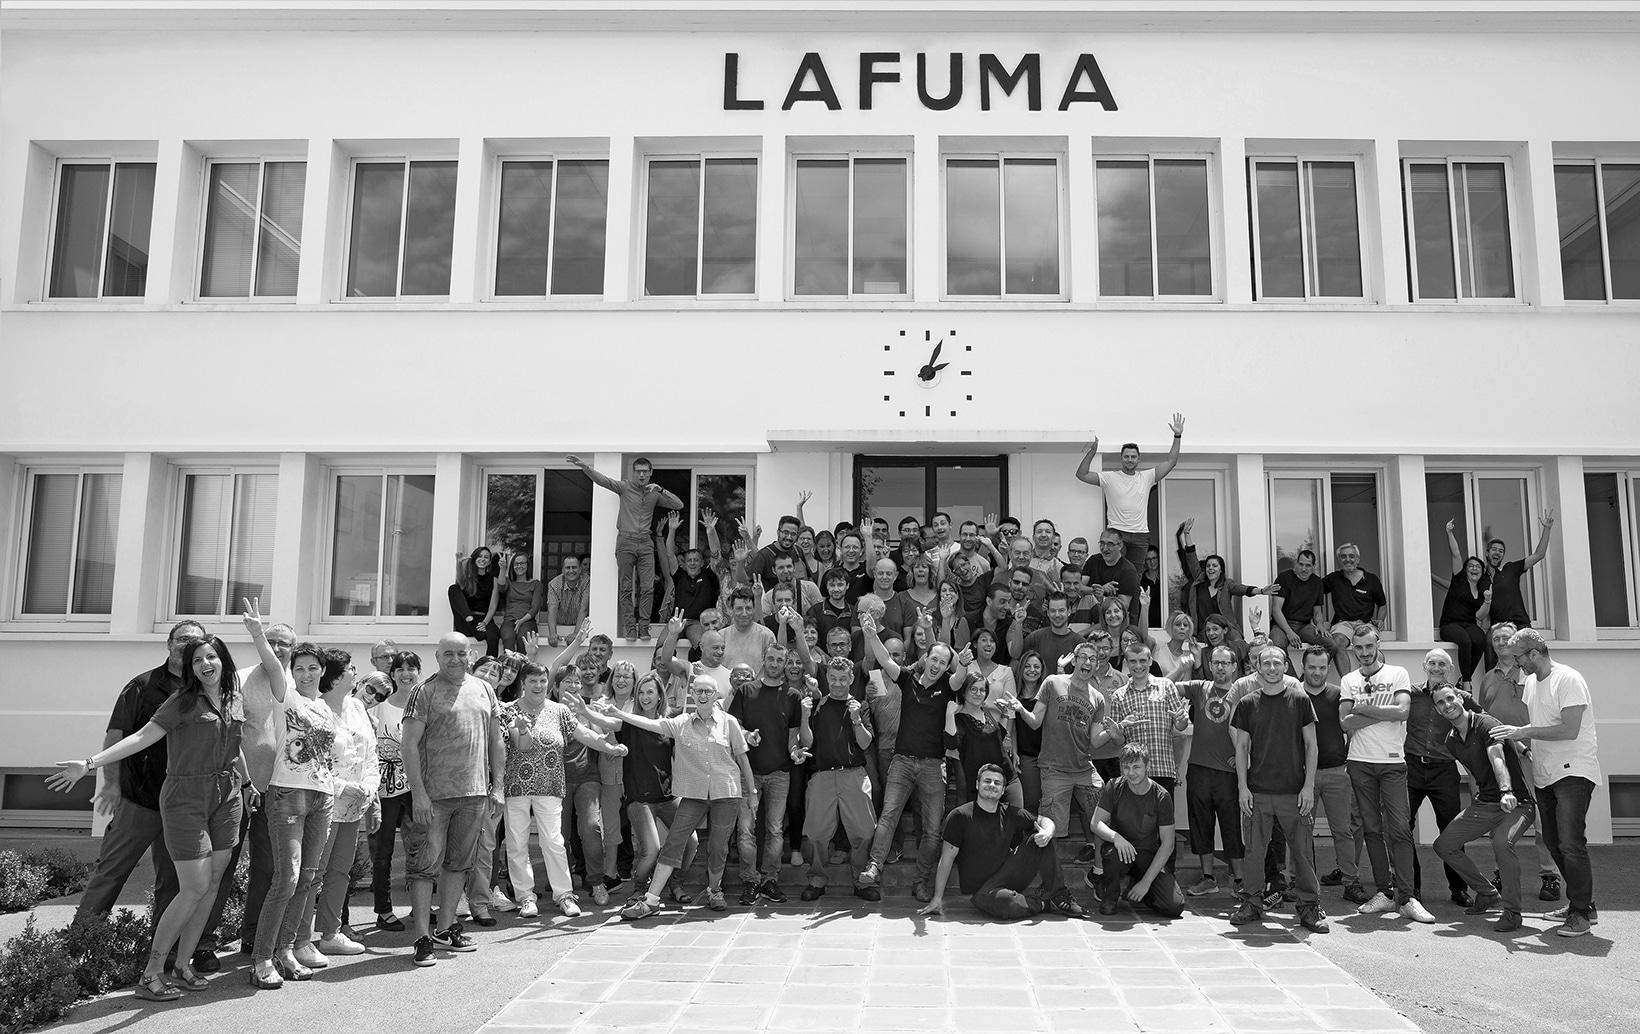 https://www.marques-de-france.fr/wp-content/uploads/2019/03/Lafuma-mobilier_anecdote.jpg